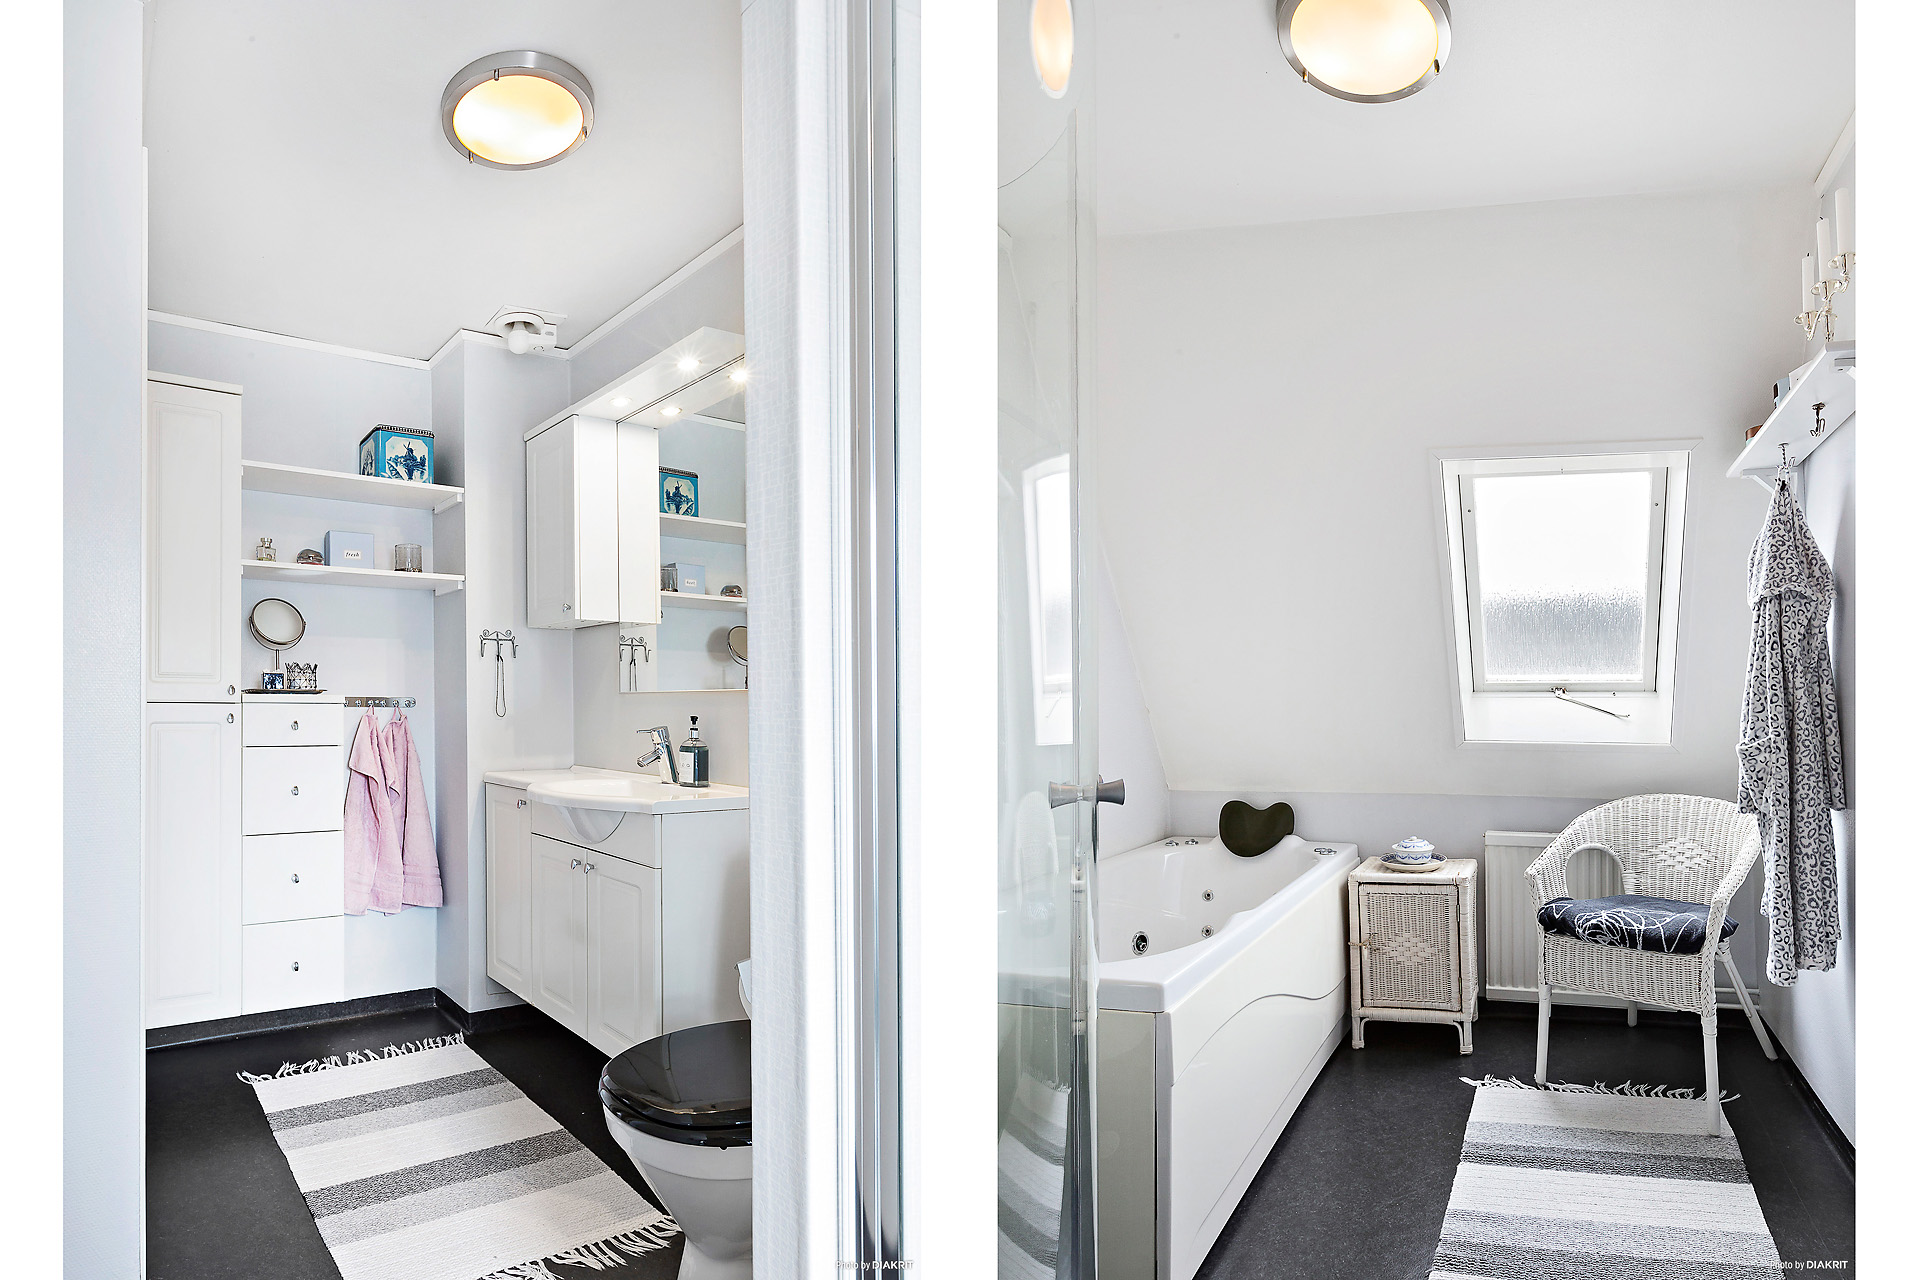 Badrum med dusch och bubbelbadkar.